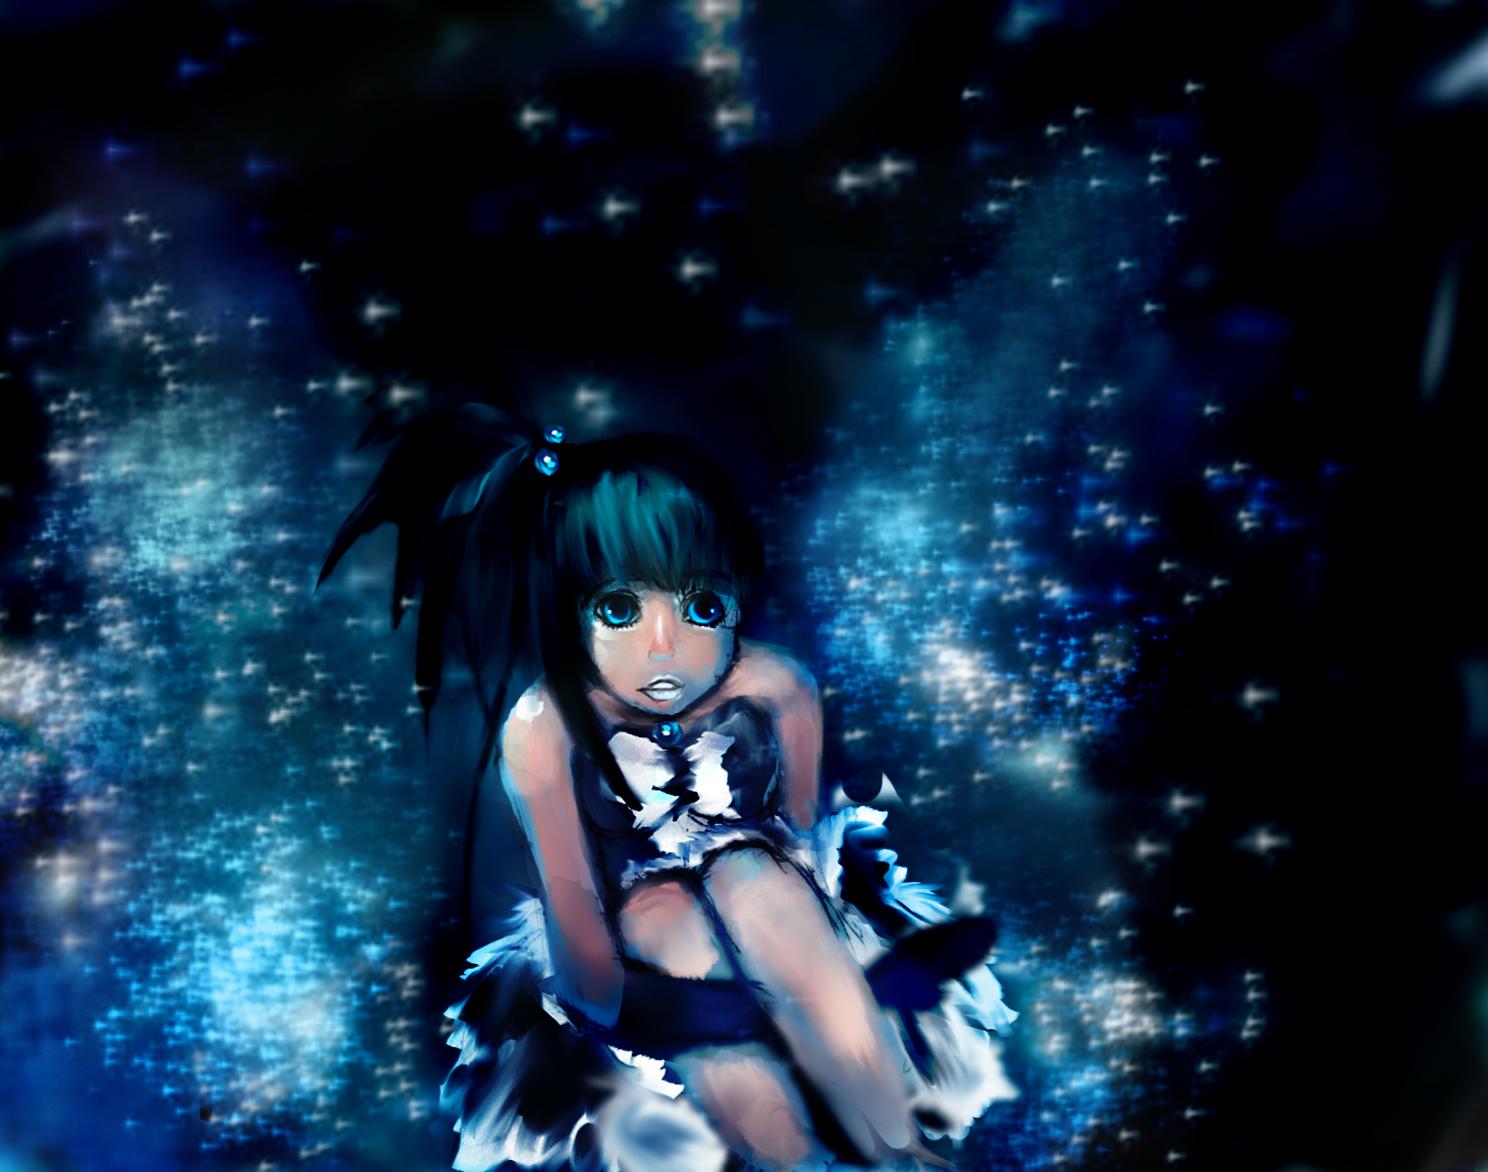 Fairy by hakublue